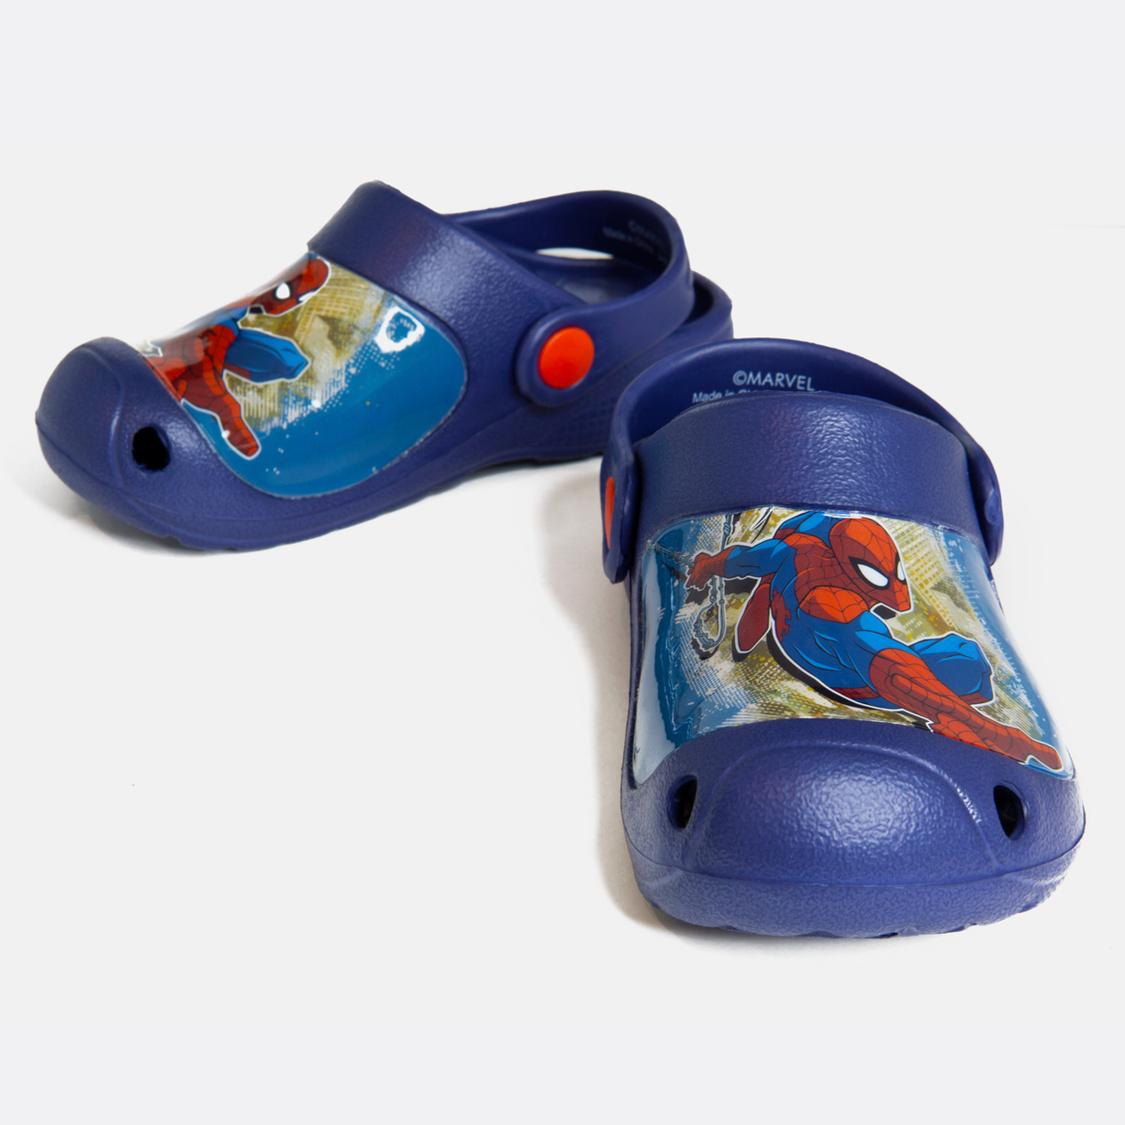 Spider-Man Print Sandals with Straps